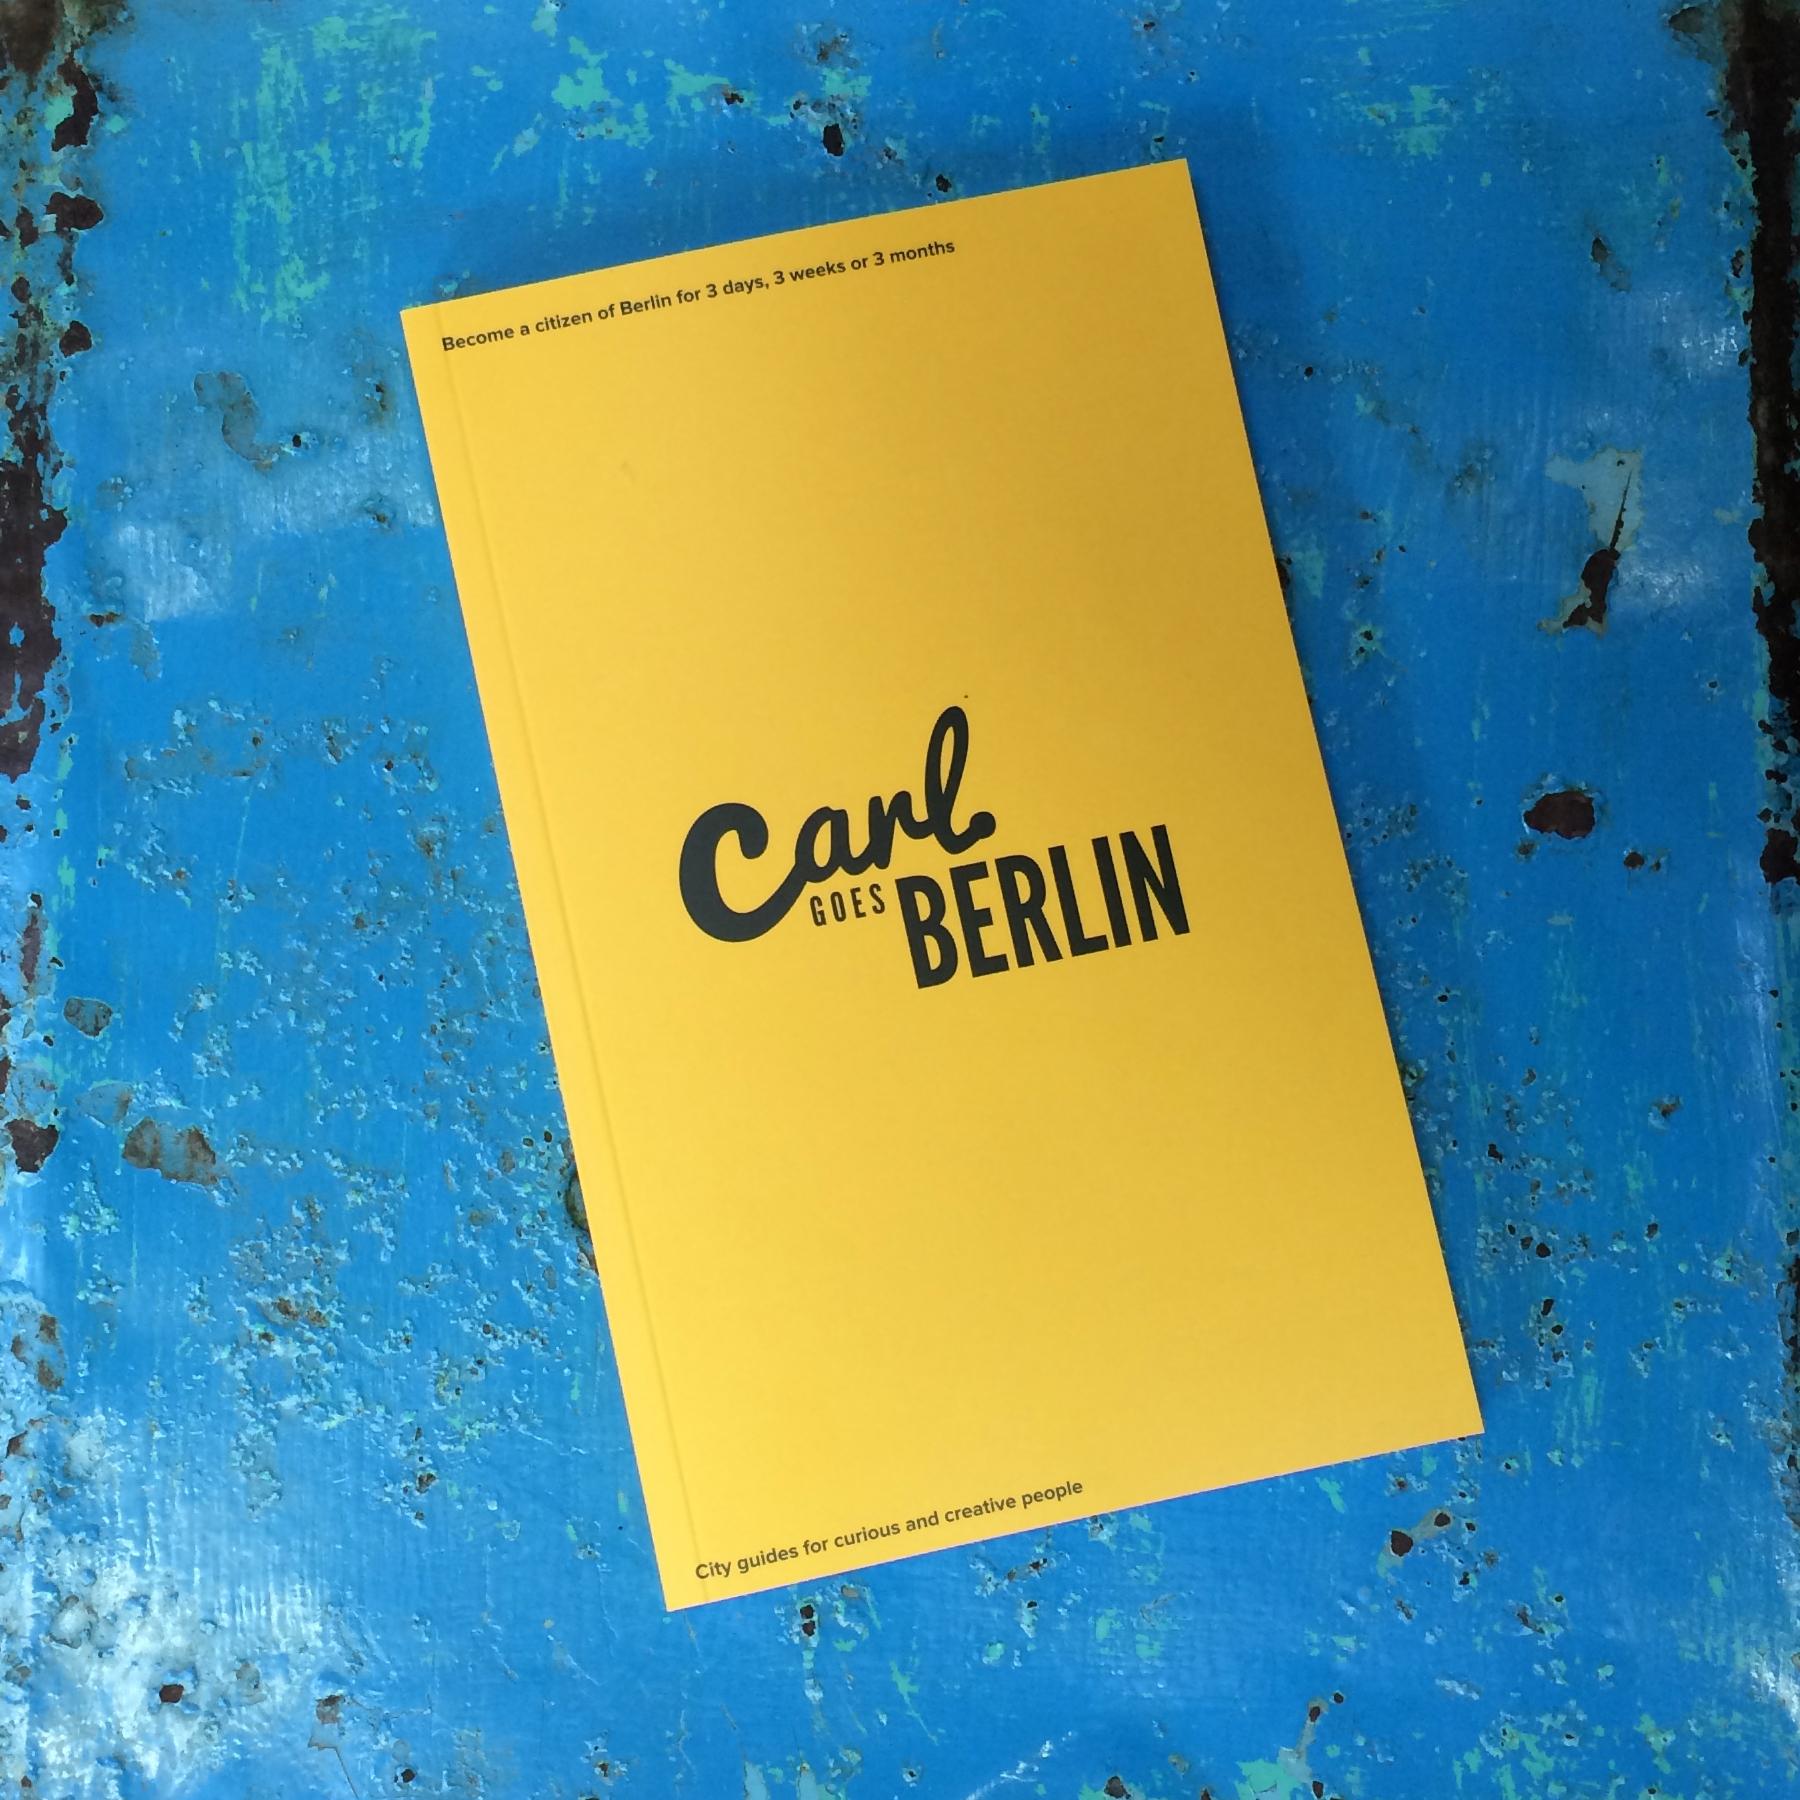 carl goes berlin cover on blue.jpg